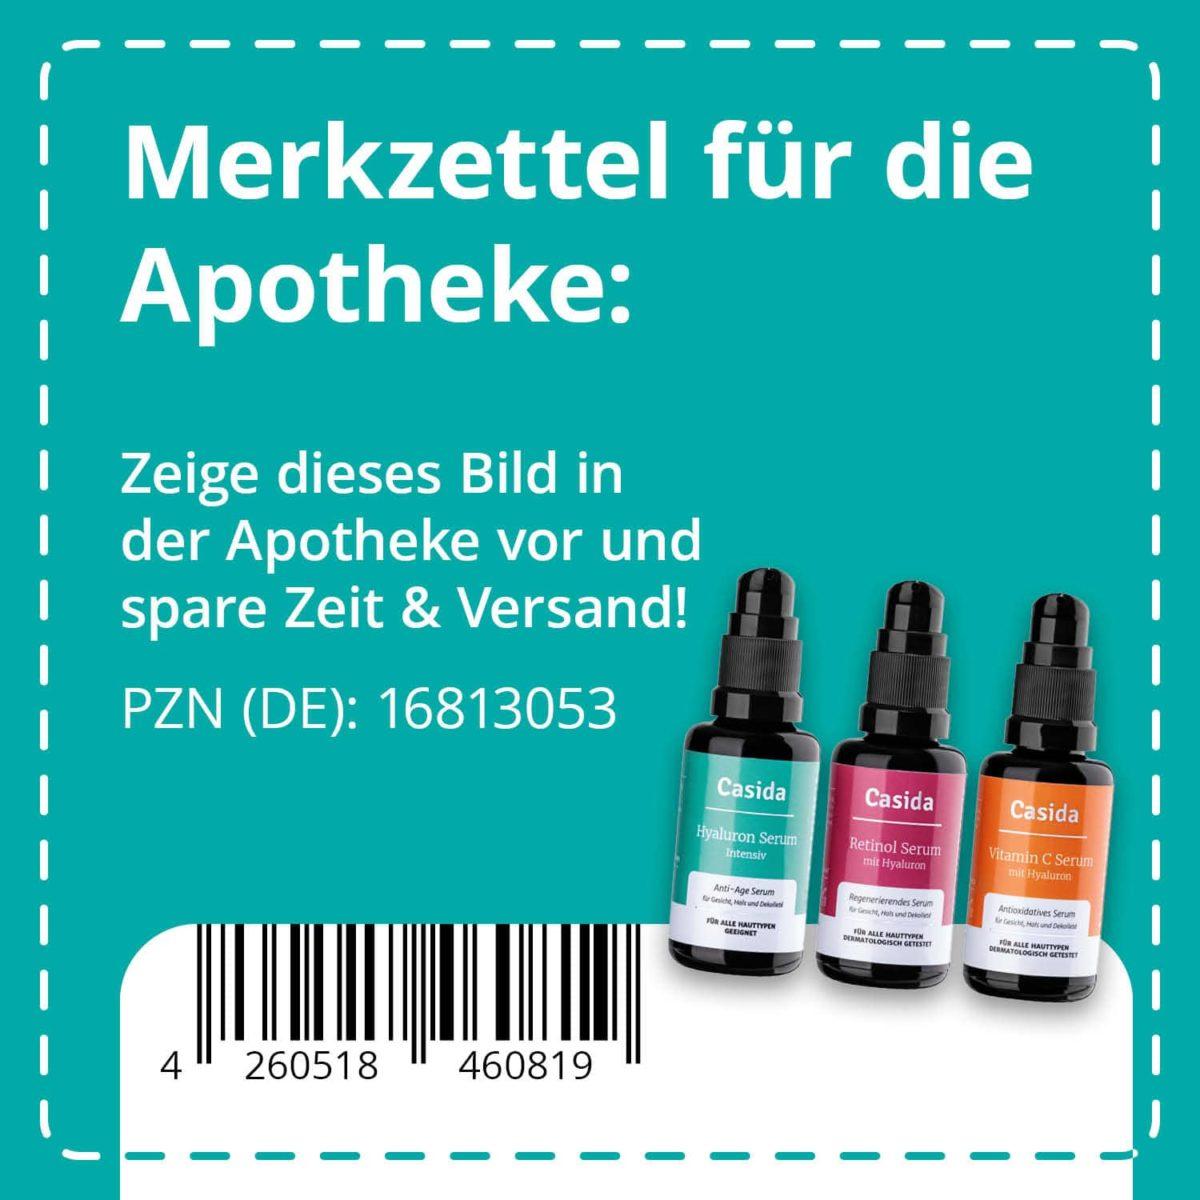 Casida Anti-Aging Set Seren & Mizellenwasser 3x30 ml PZN DE 16813053 UVP 69,95 € EAN 4260518460819